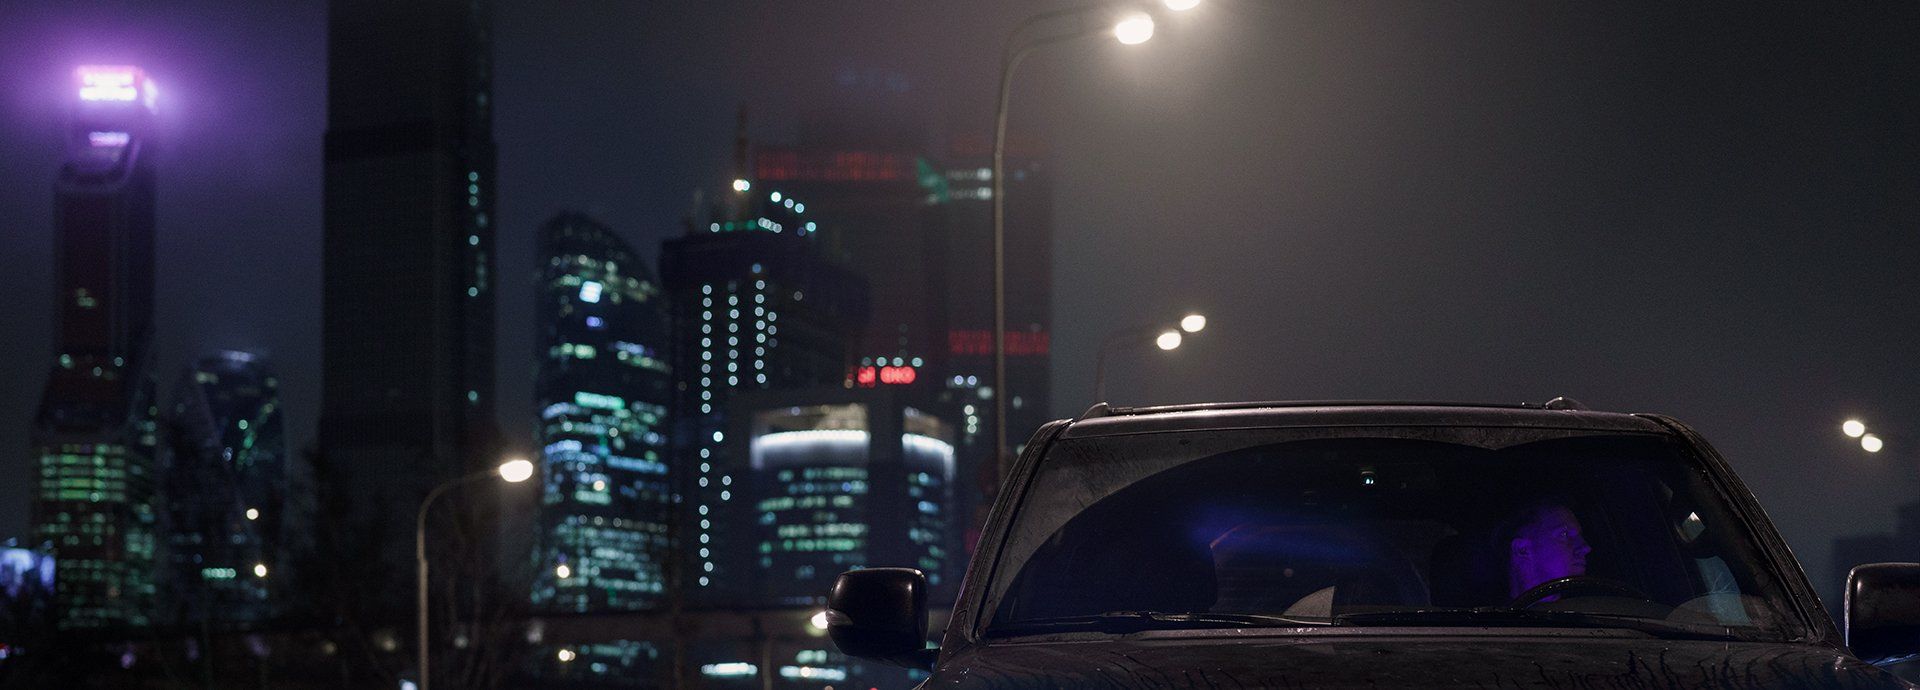 man, city. alone, lonely, lonelyness, night, nightlight, понаехавшие, car, lexus, purple, conceptual, fog, moscow, moscow-city, Роман Филиппов